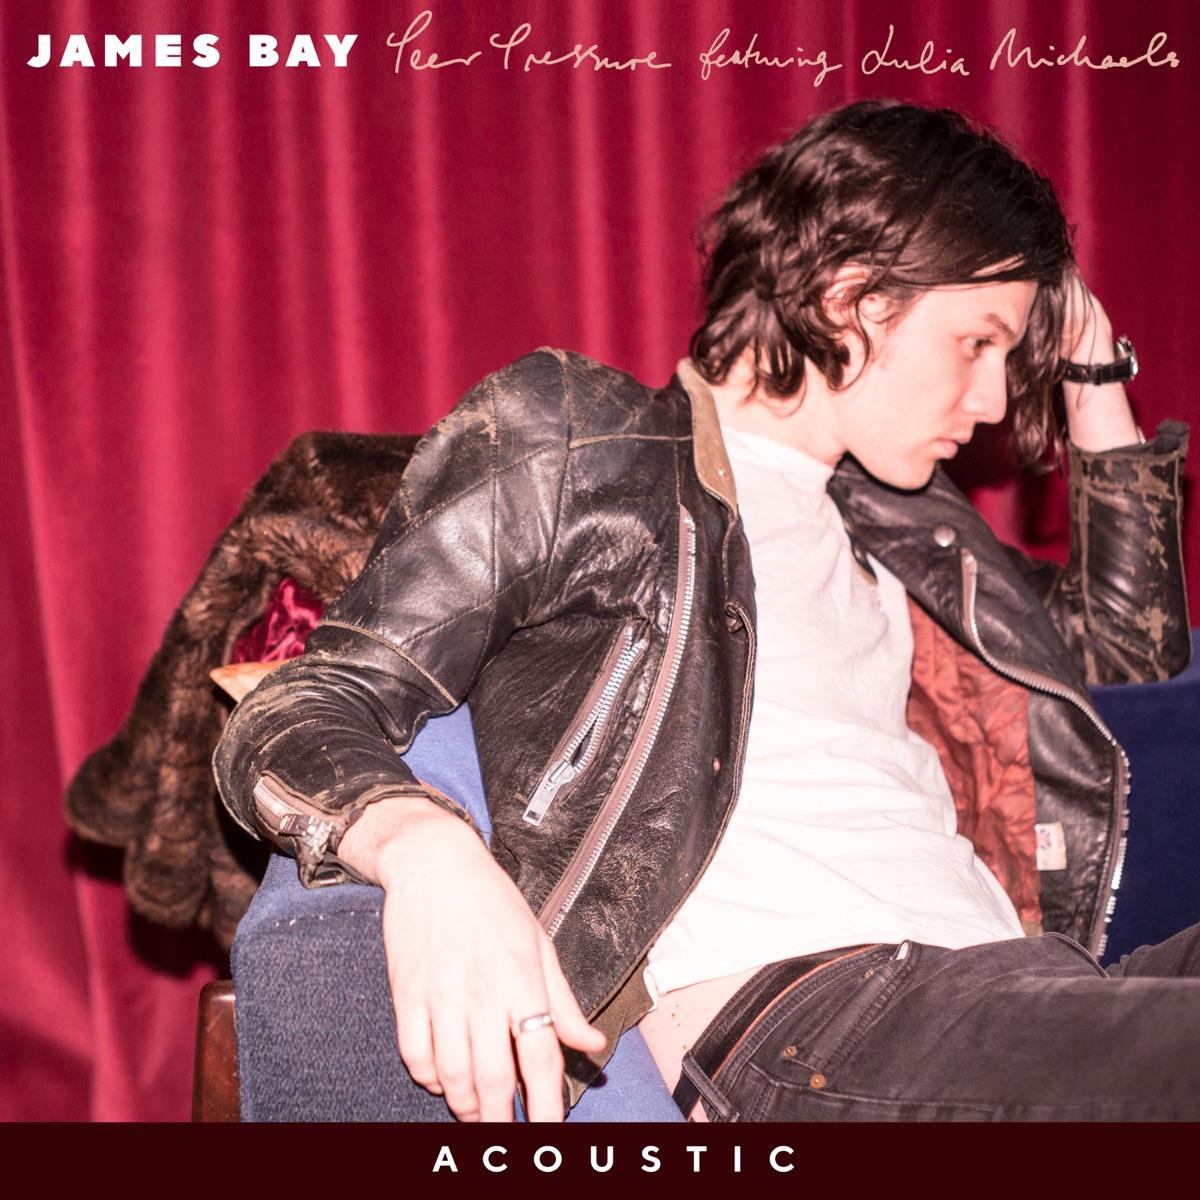 Peer Pressure feat Julia Michaels Acoustic - Single James Bay CD cover